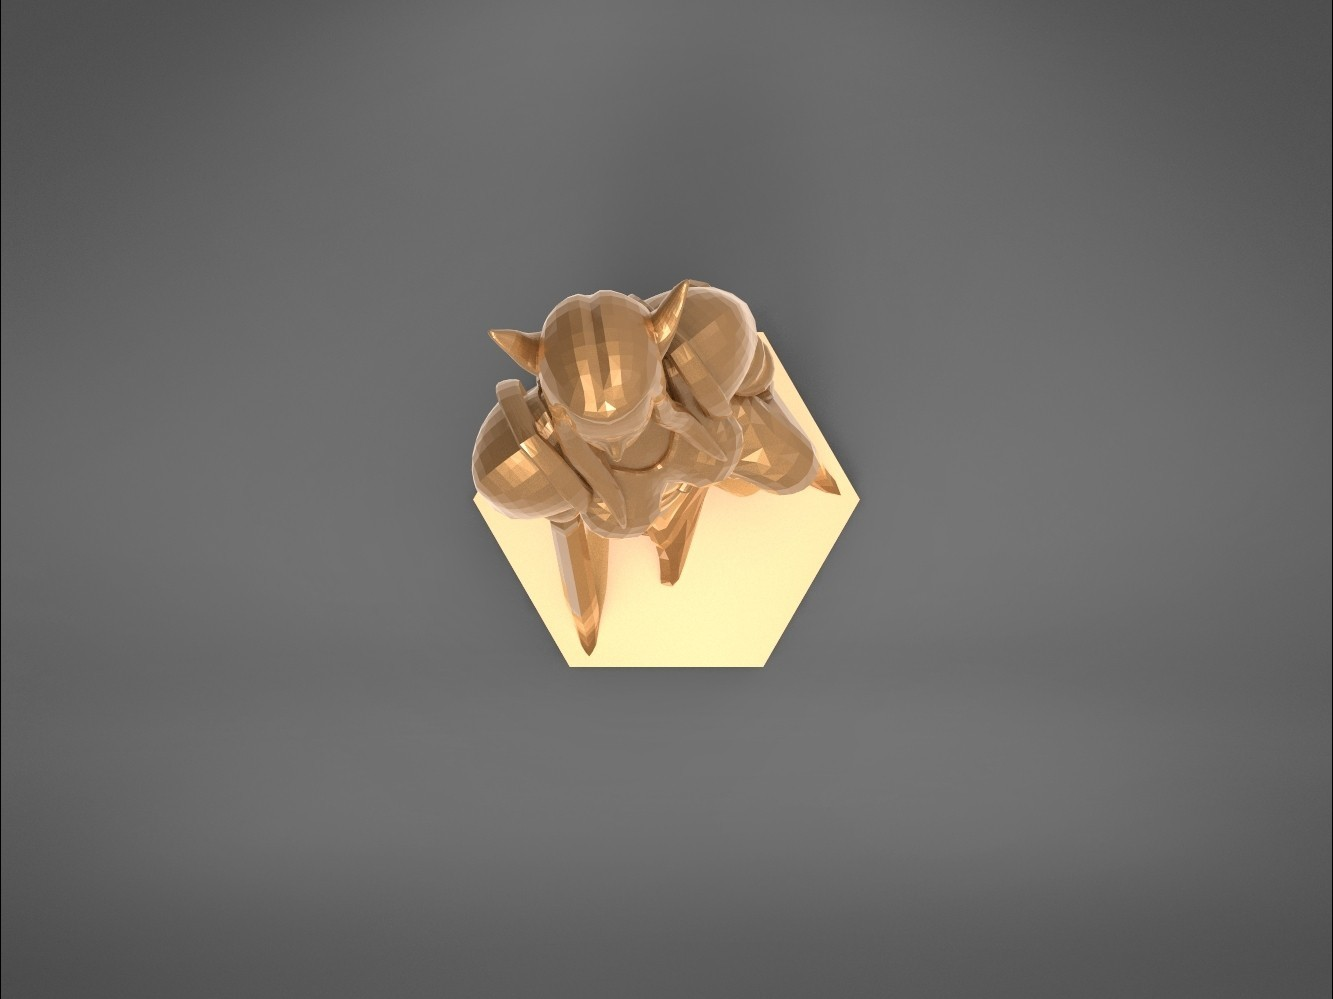 Warrior_2-top_perspective.315.jpg Download STL file ELF WARRIOR FEMALE CHARACTER GAME FIGURE 3D print model • 3D printing object, 3D-mon